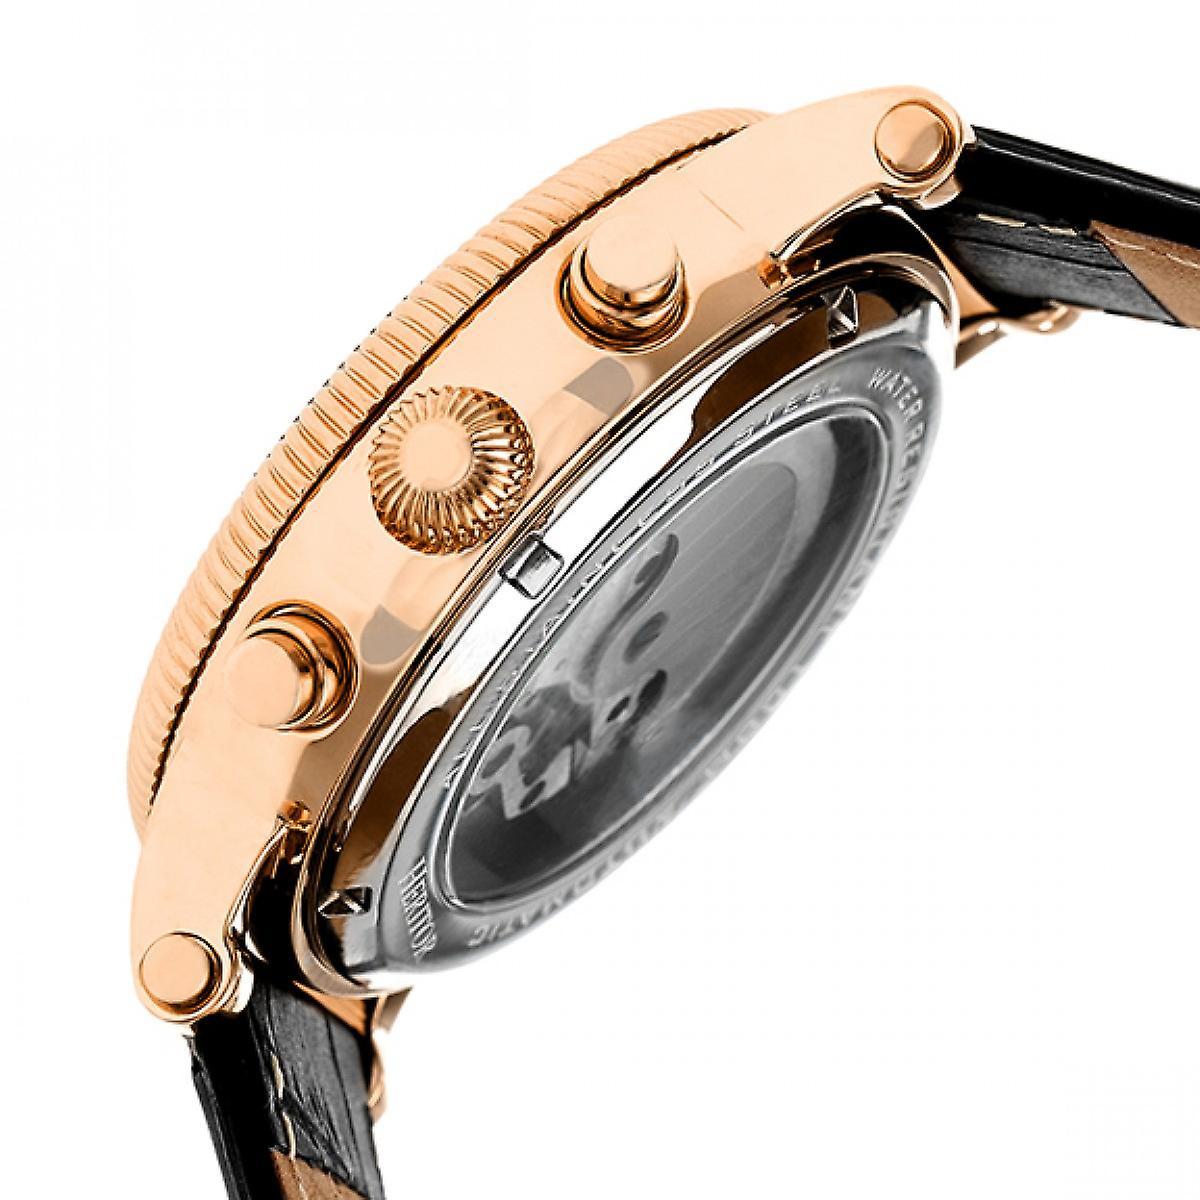 Heritor Automatic Winston Semi-Skeleton Leather-Band Watch - Rose Gold/Black